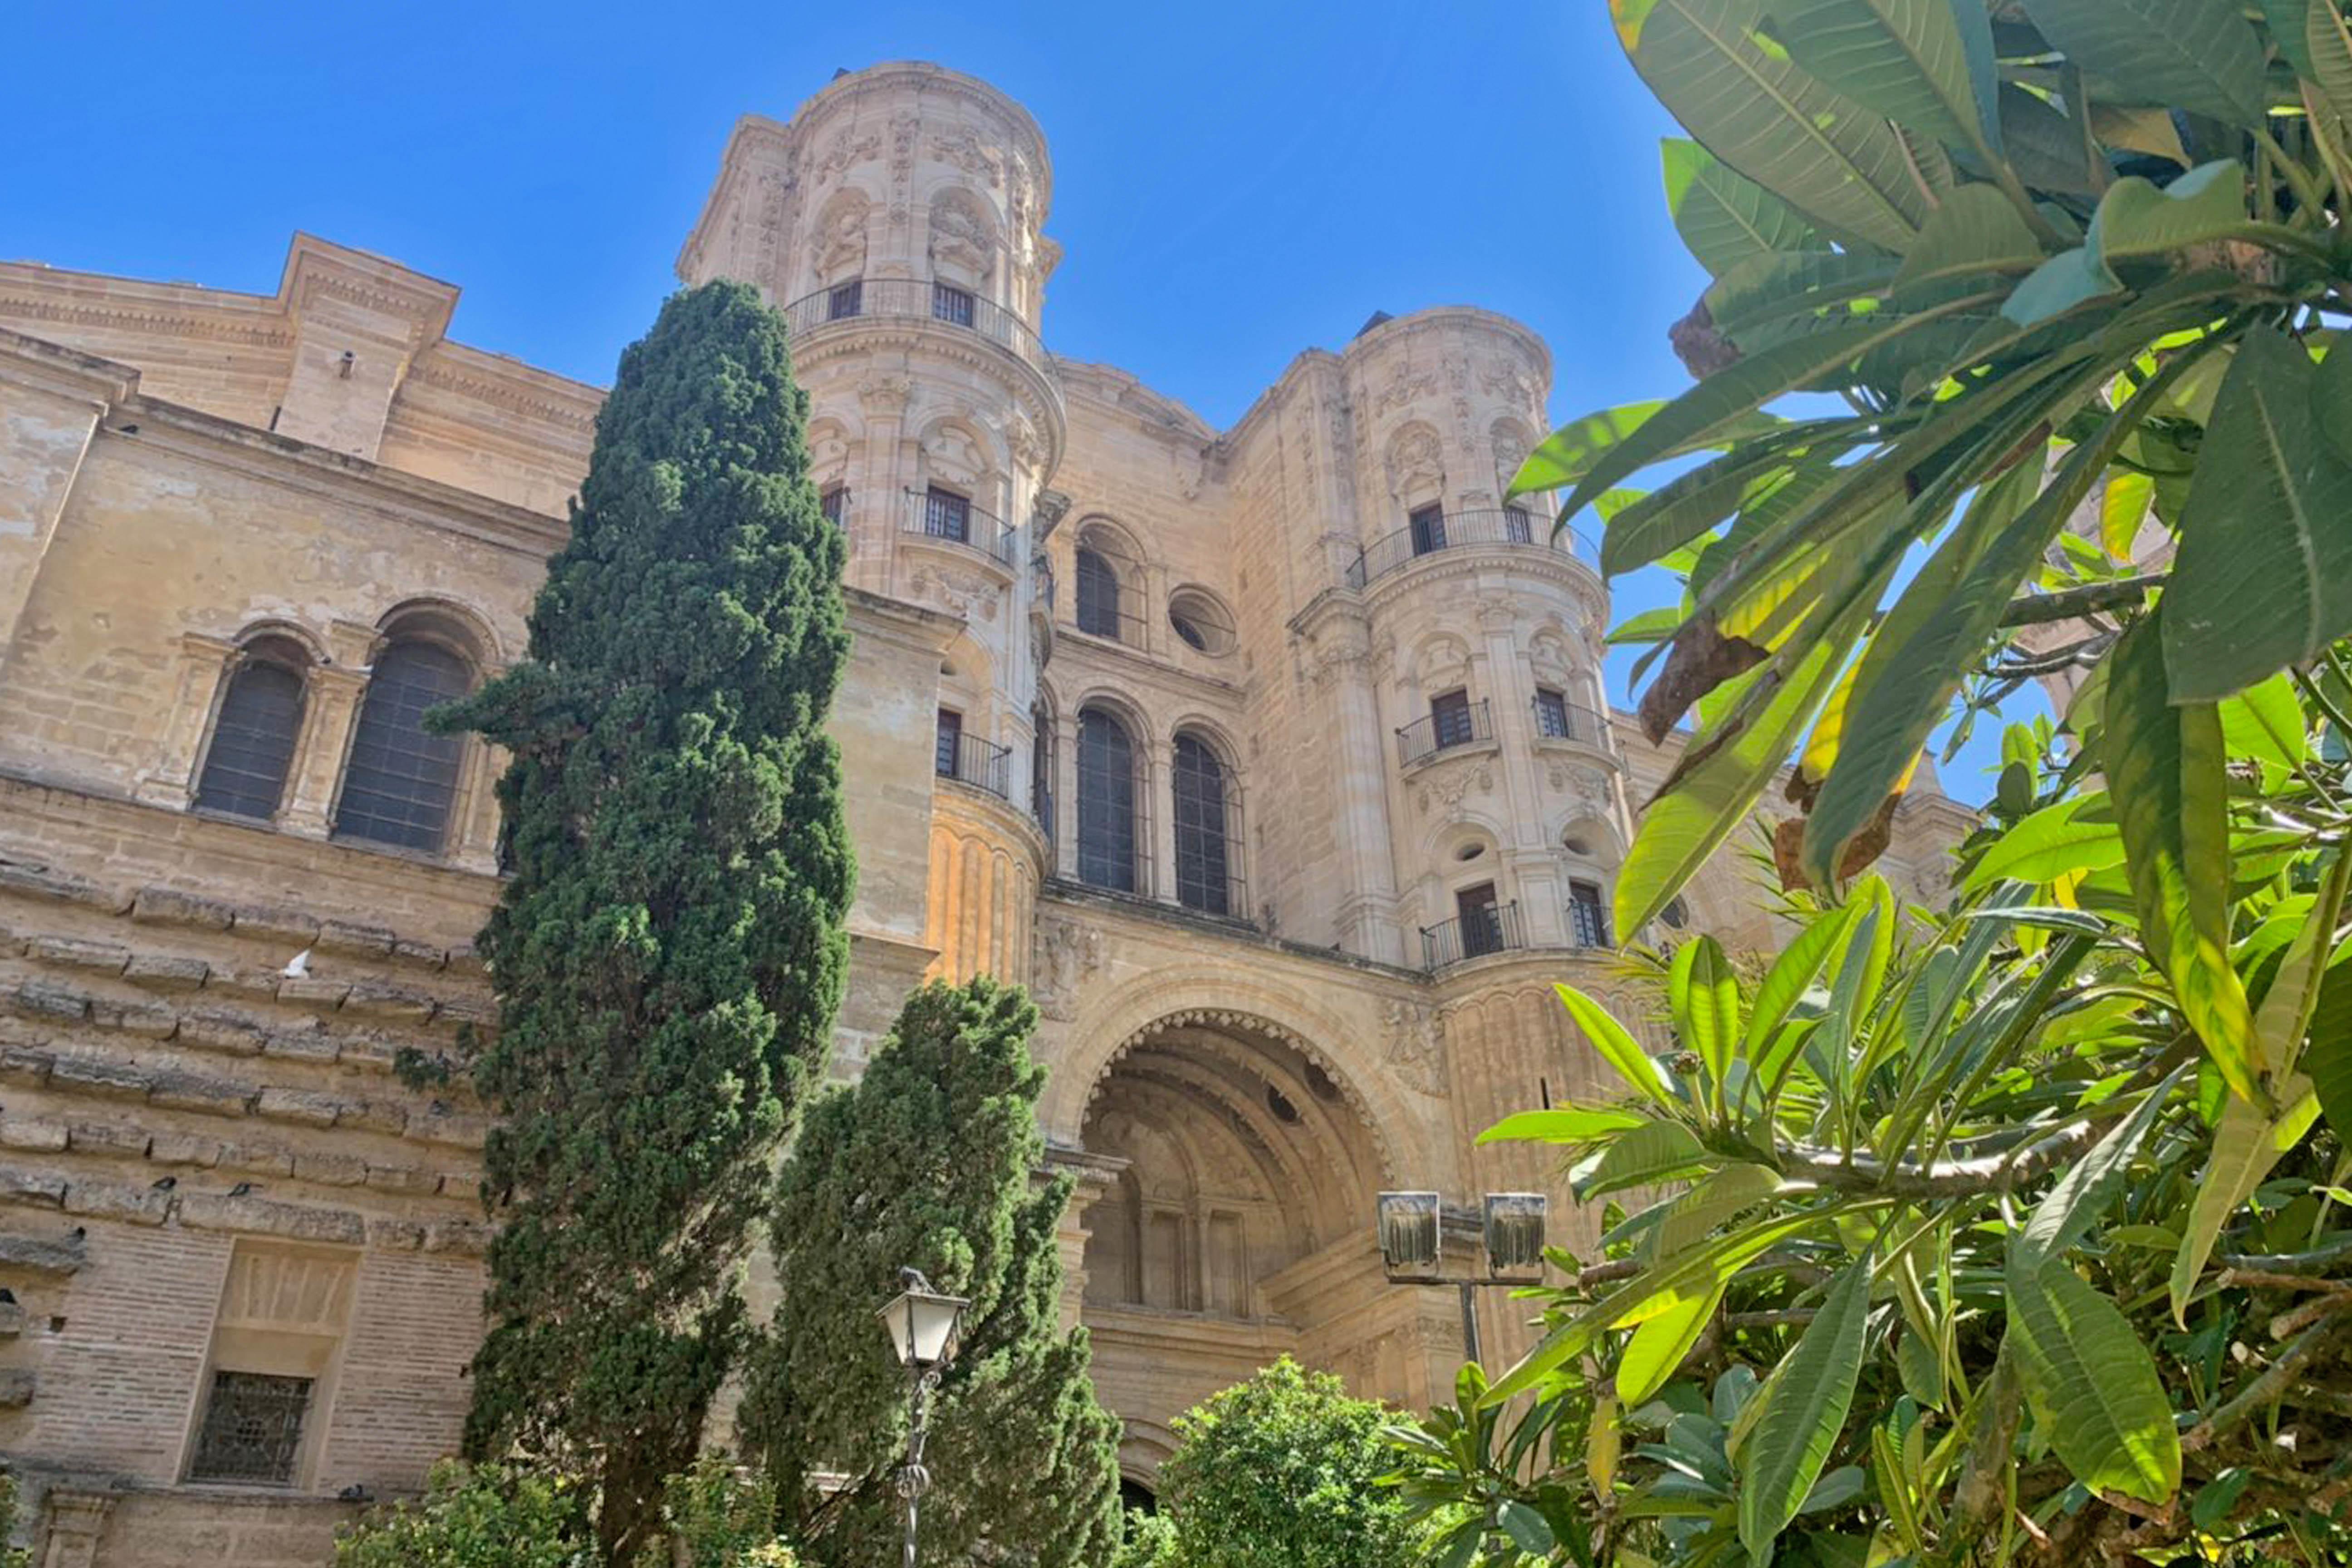 Free-Tour-historic-centre-of-Malaga-at-sunset-4